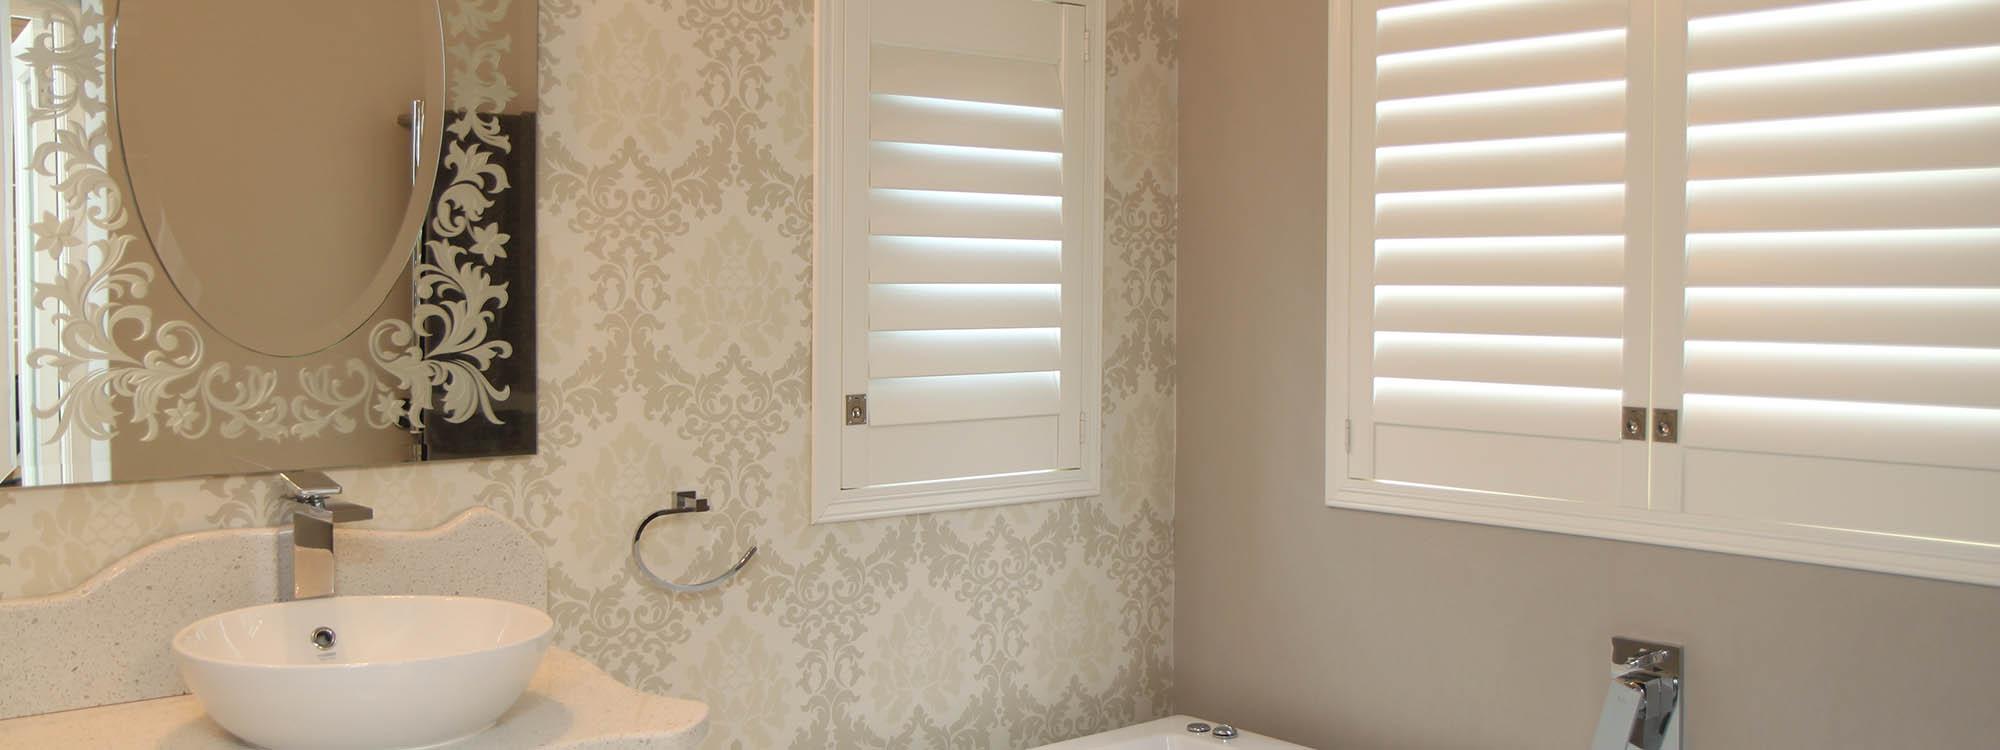 Decowood-shutters-bathroom-hinged-window